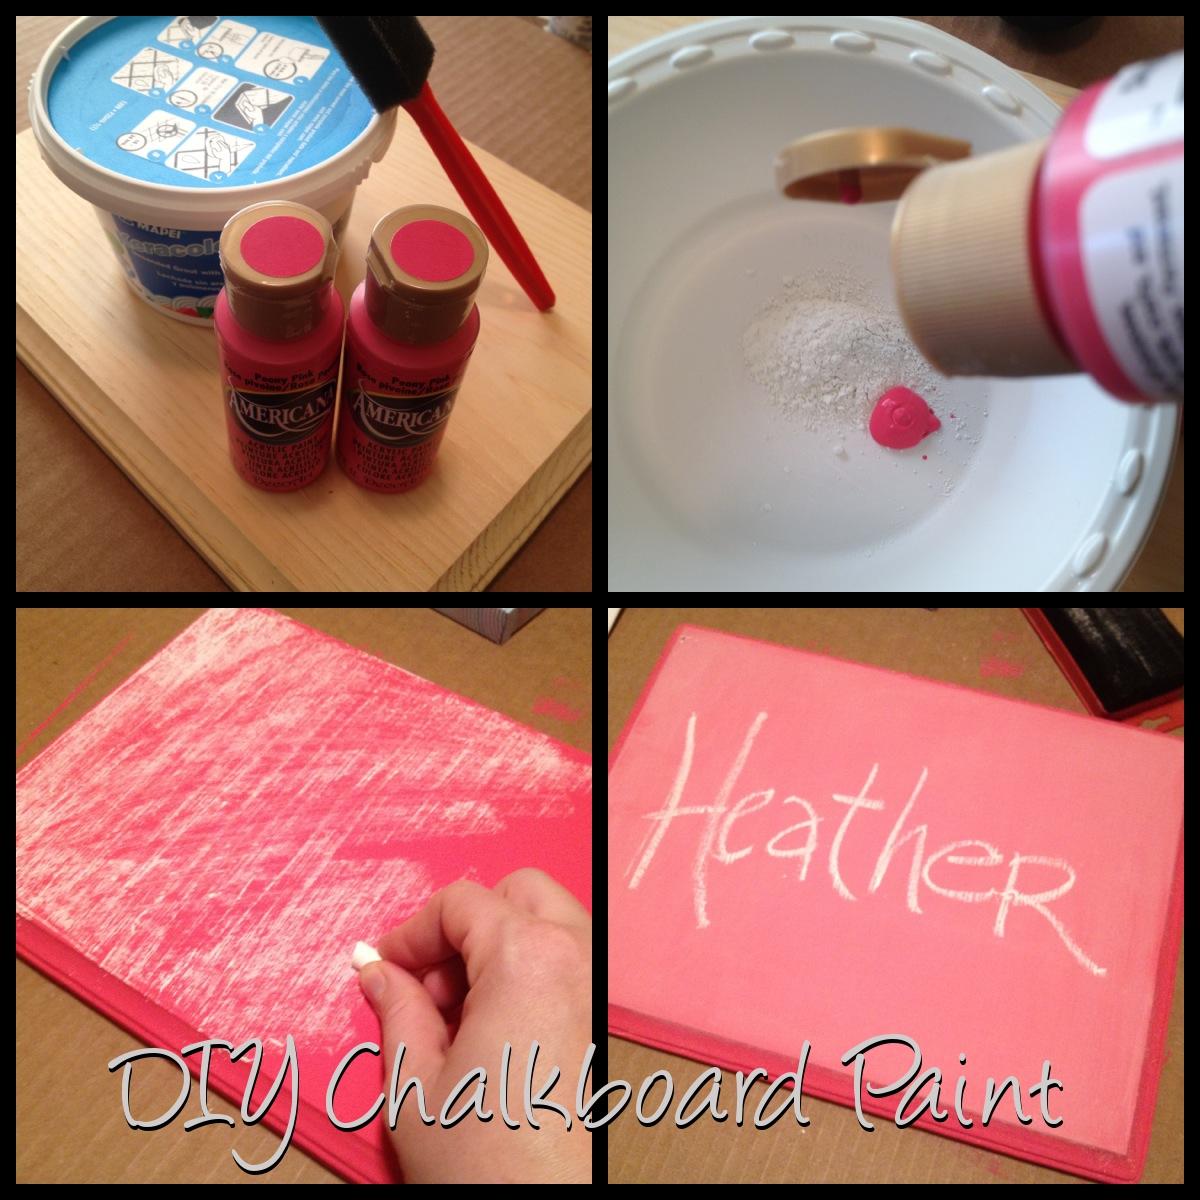 Diy Chalkboard Paint 7 52 Ht The Blog